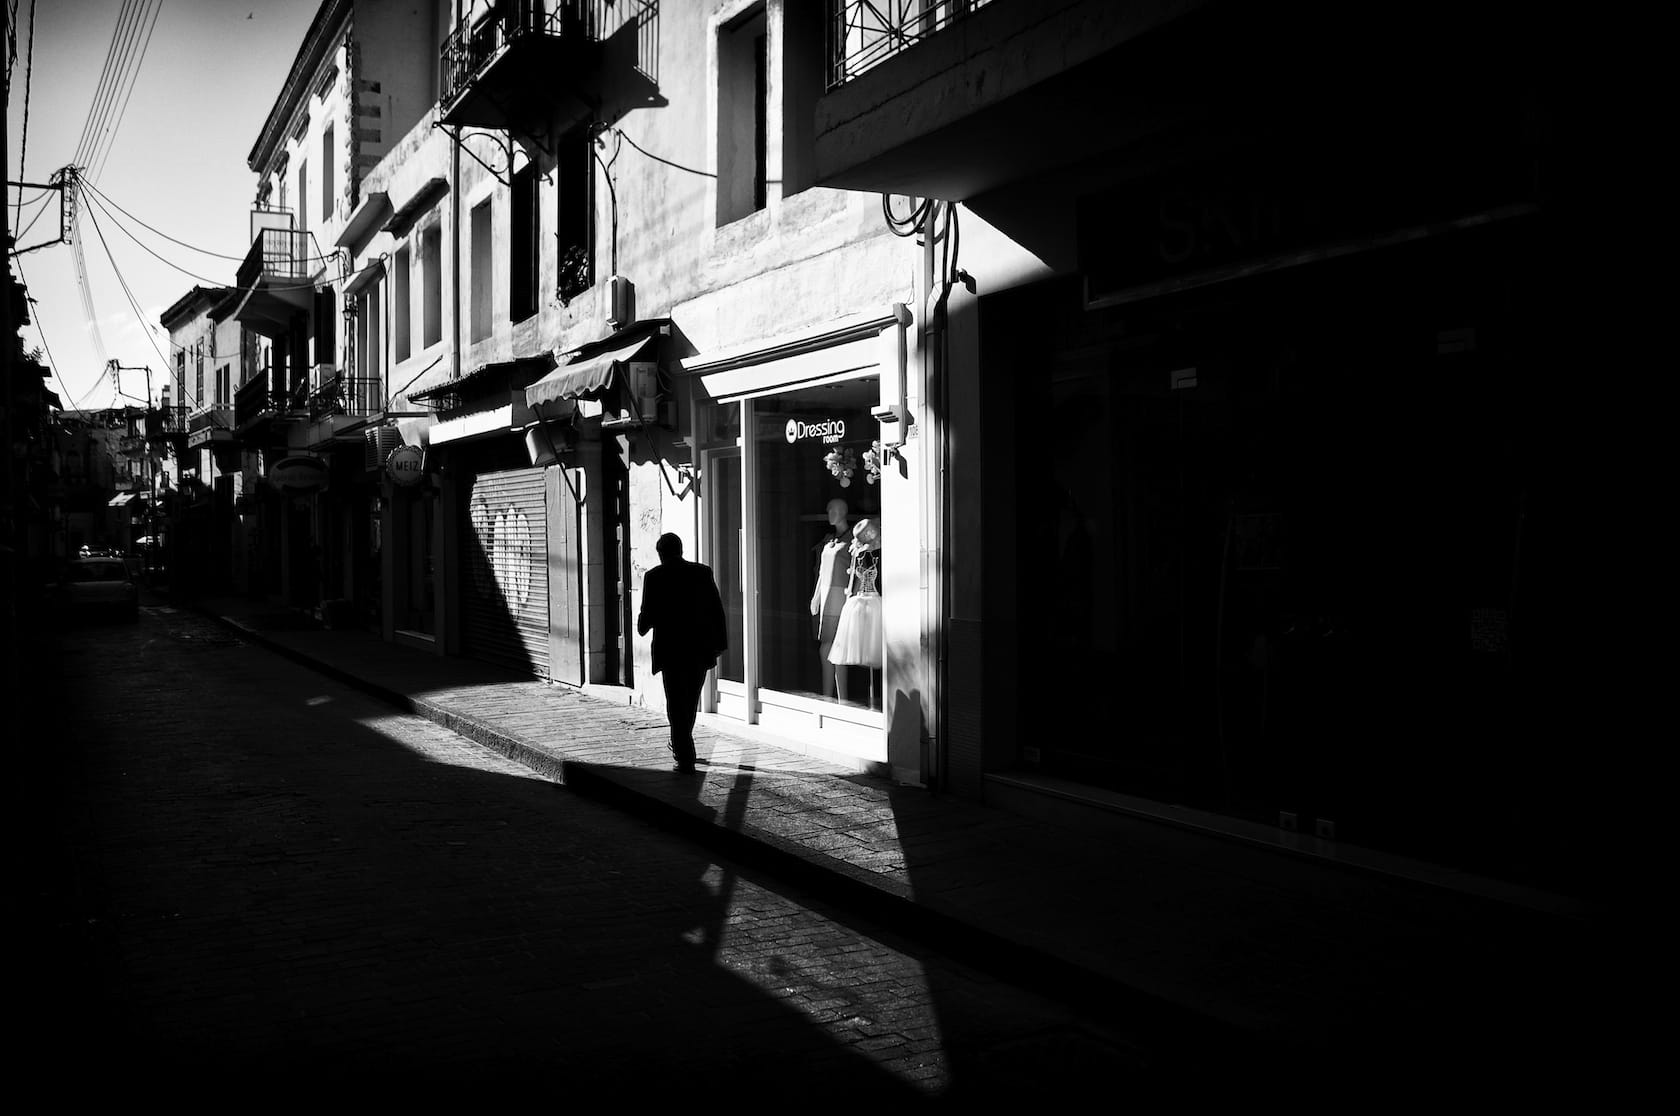 """Shadowplay"" by Spyros Papaspyropoulos"